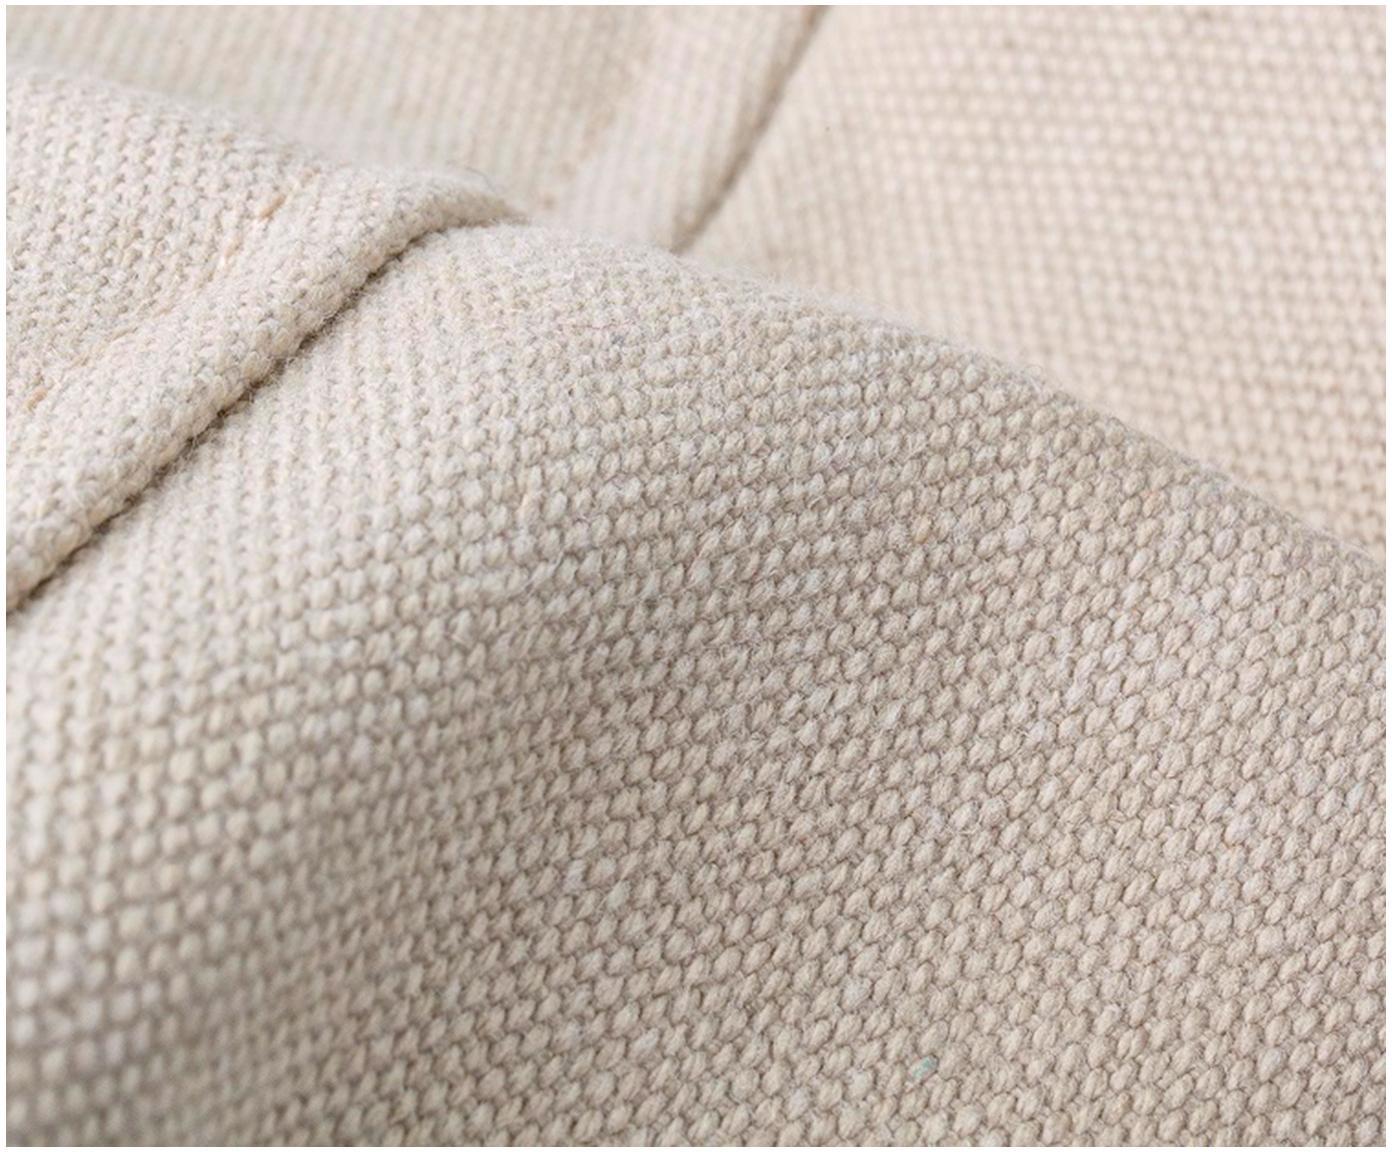 Outdoor-Sitzsack Meadow, Bezug: 75% Baumwolle, 25% Polyes, Creme, 130 x 160 cm